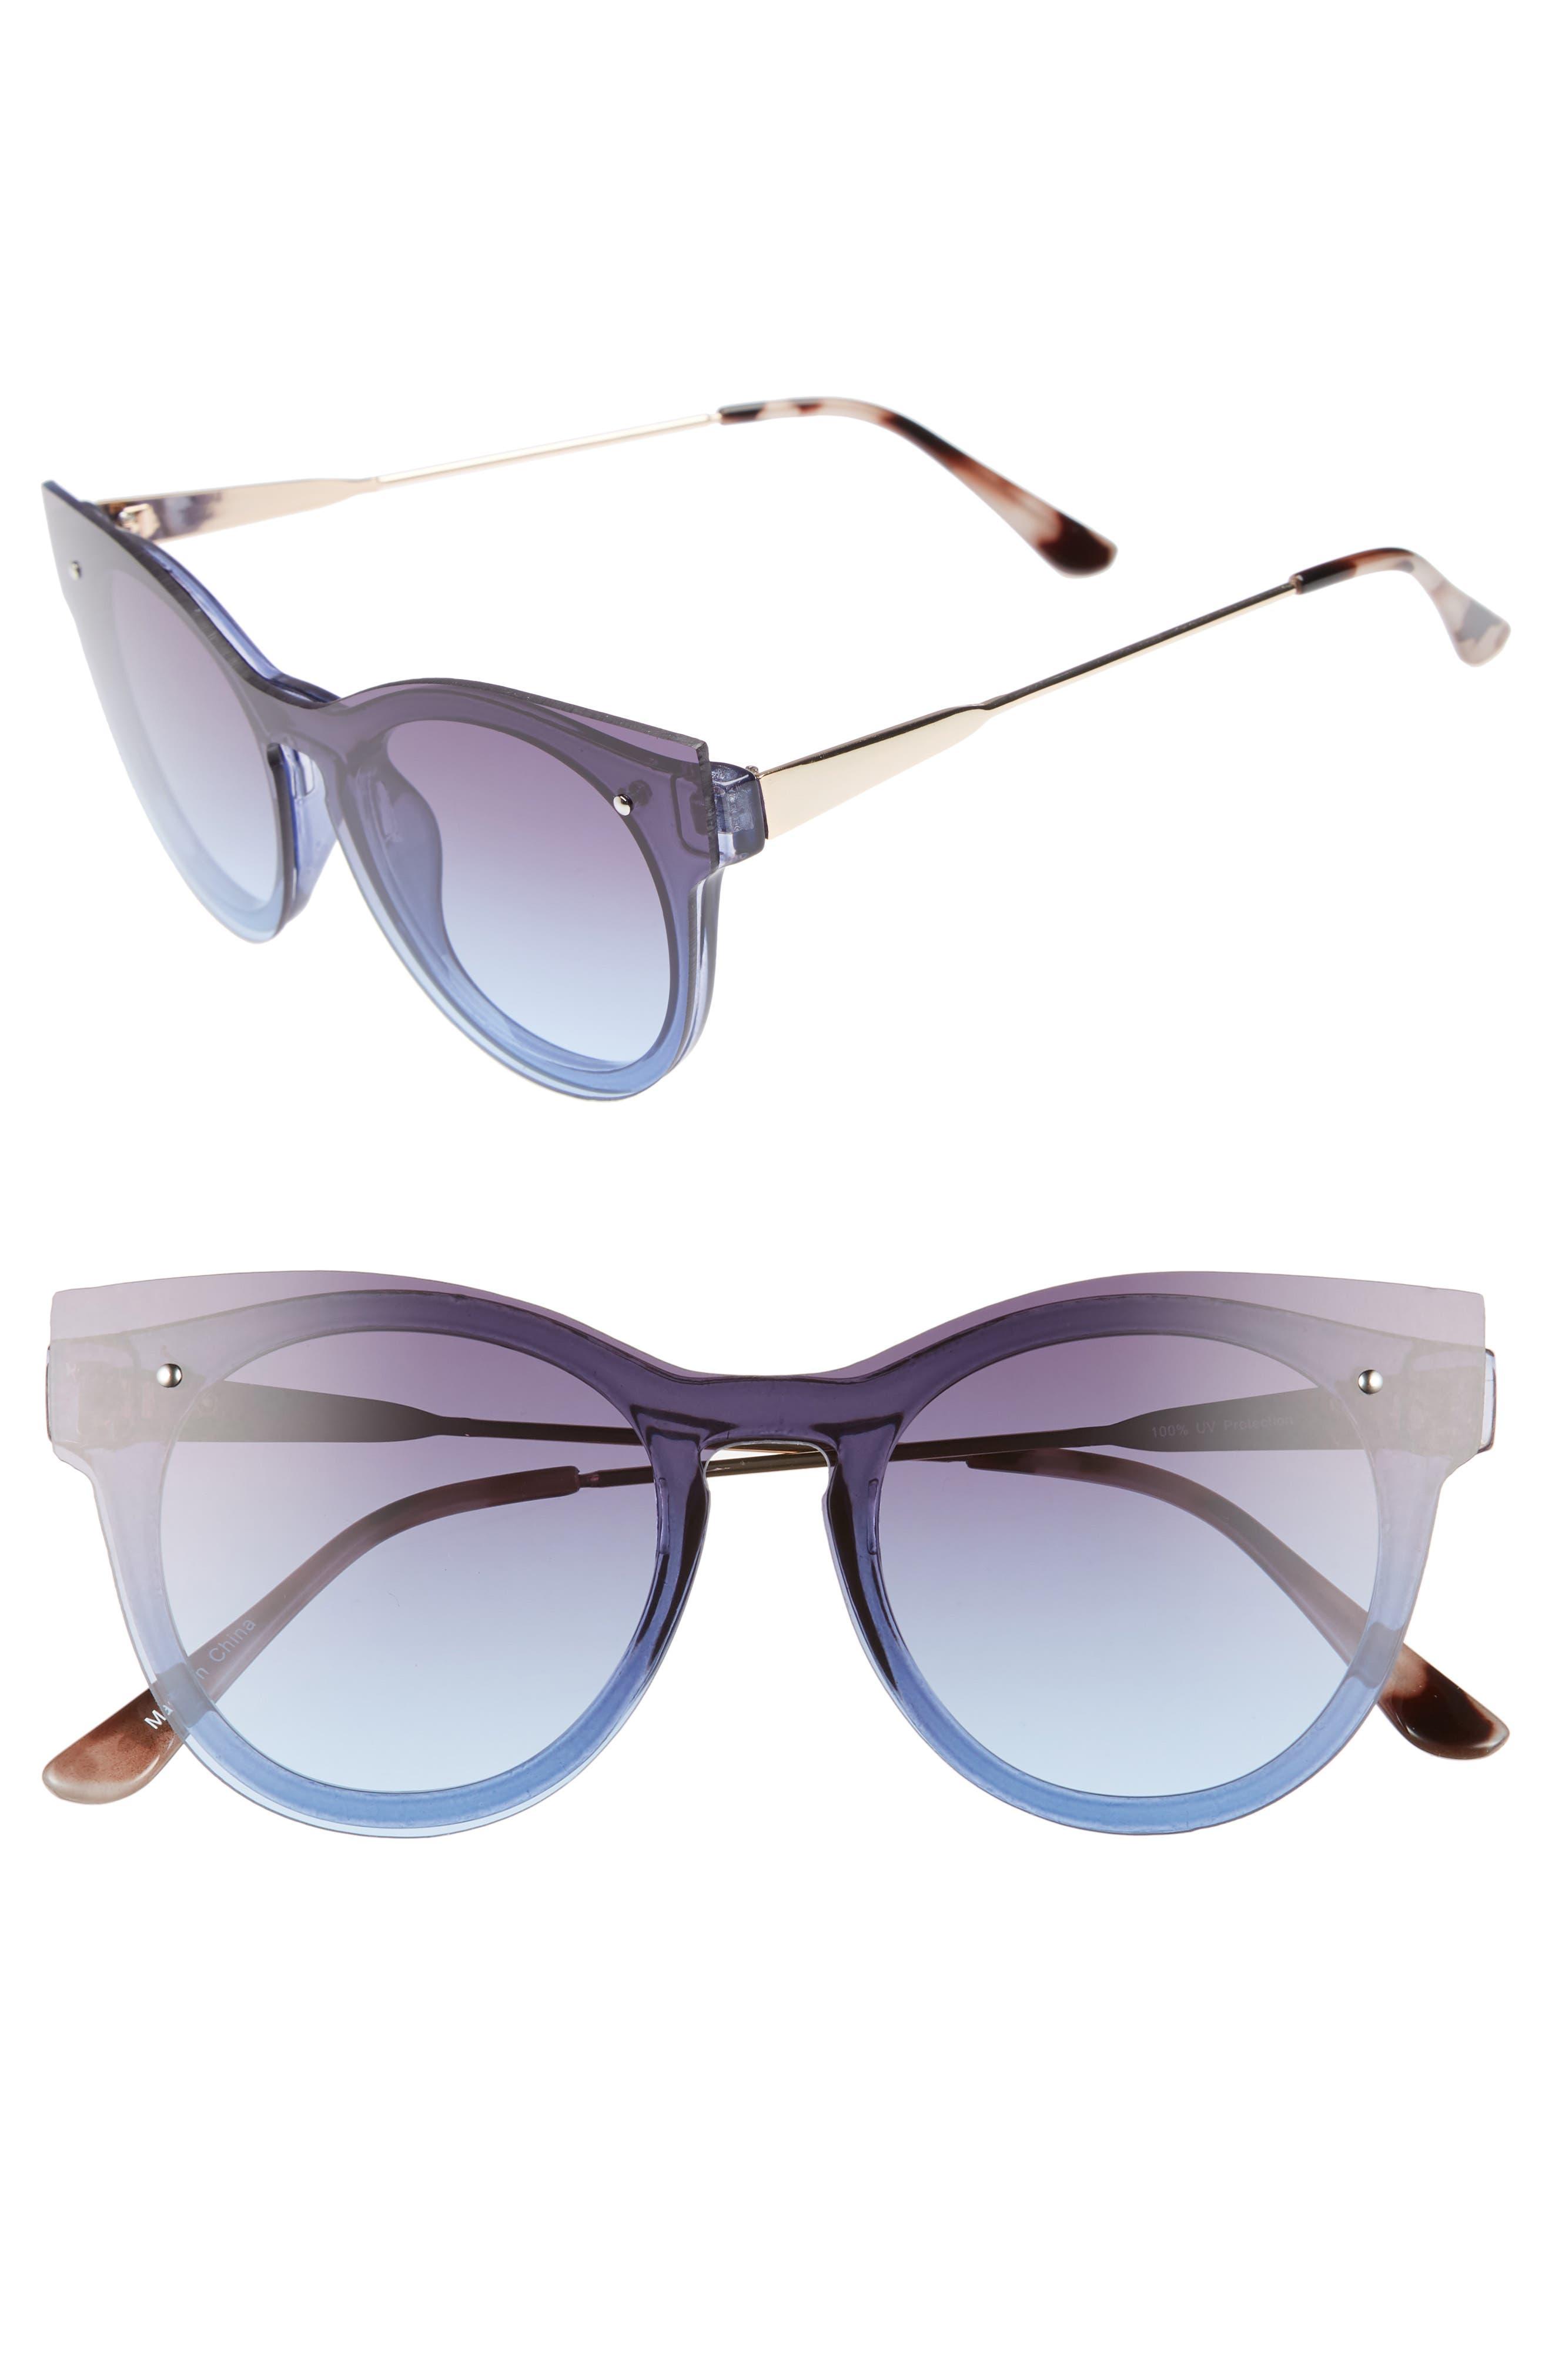 51mm Flat Cat Eye Sunglasses,                             Main thumbnail 1, color,                             Gold/ Blue